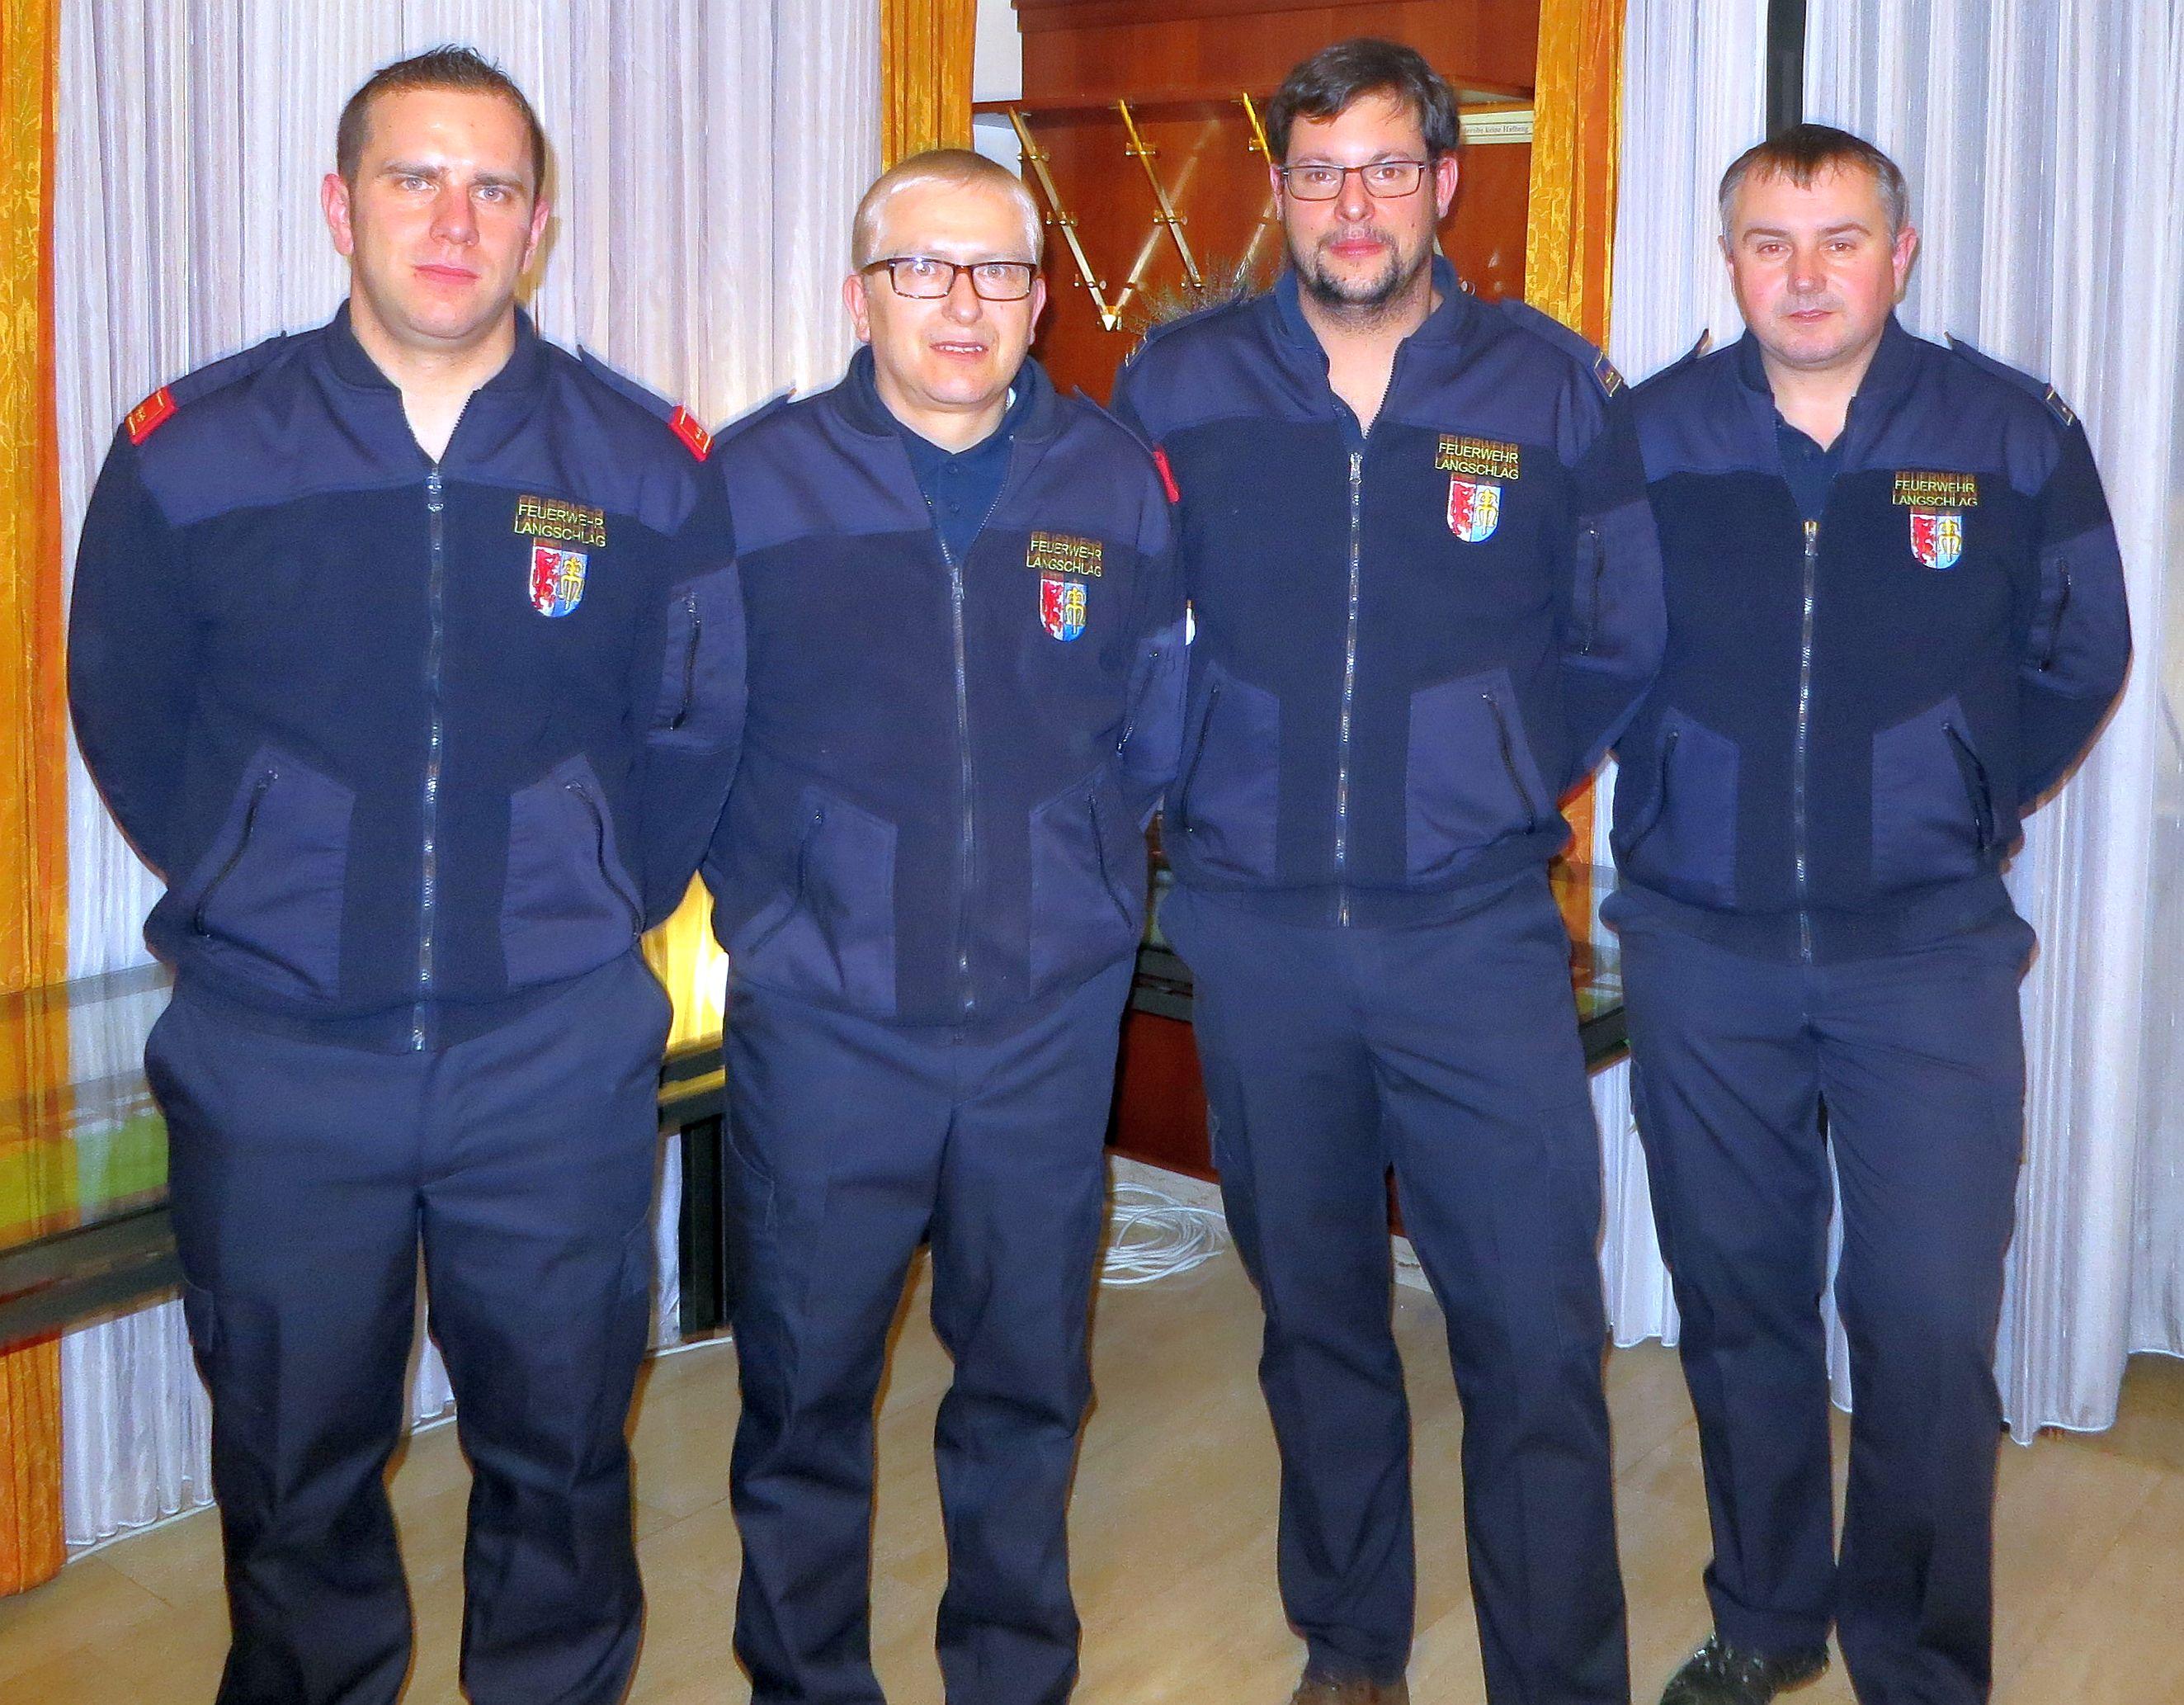 von links das neue Kommando mit StV OBI Eder Mario, Kdt. ABI Laister Sigmund, LdV OV Leopoldseder Markus, LdV Stv V Amon Reinhard